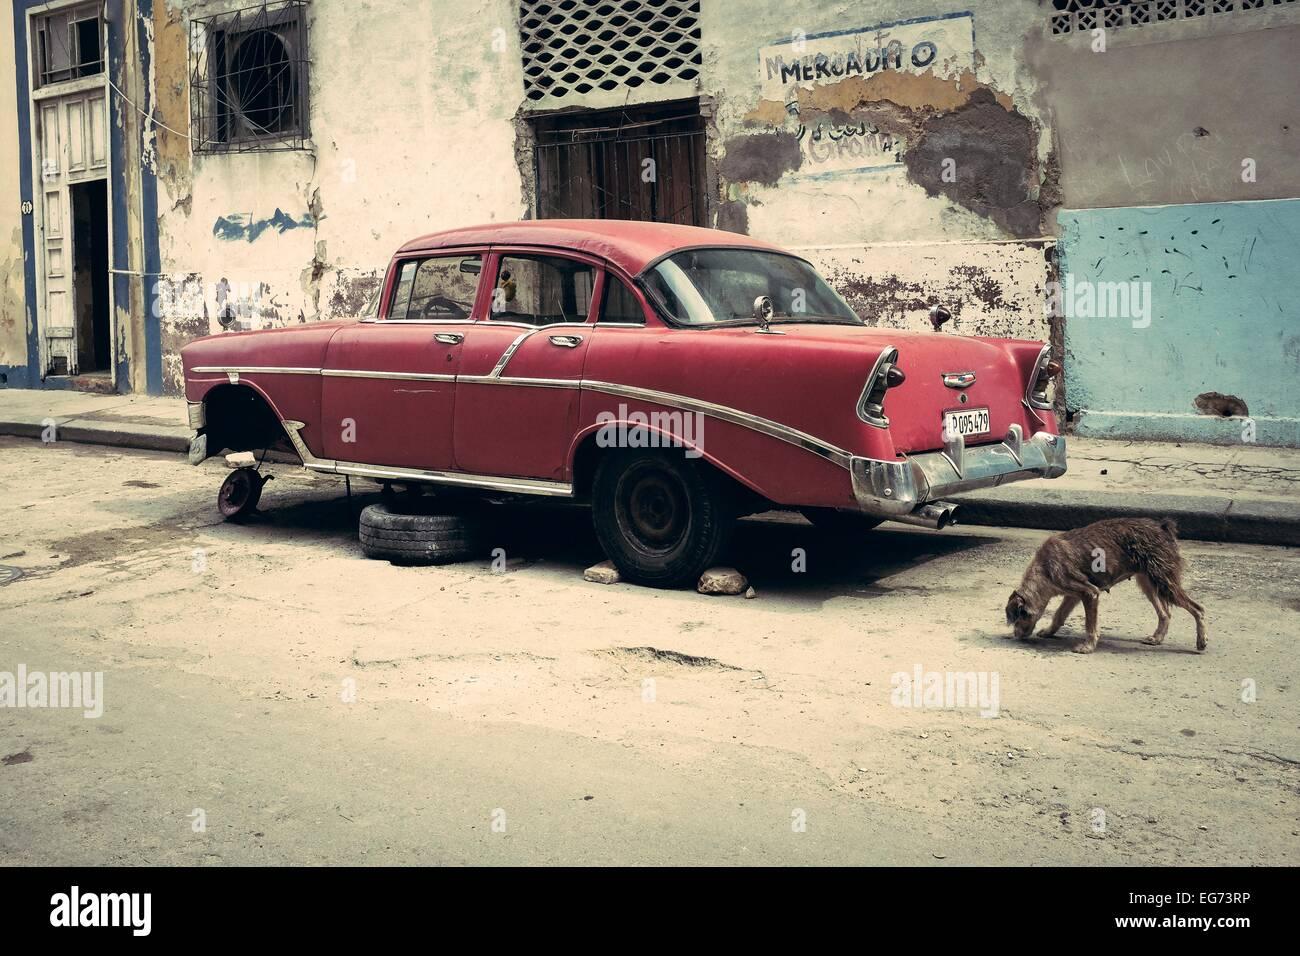 Cuban classic car parked in a central Havana street. Cuba. - Stock Image